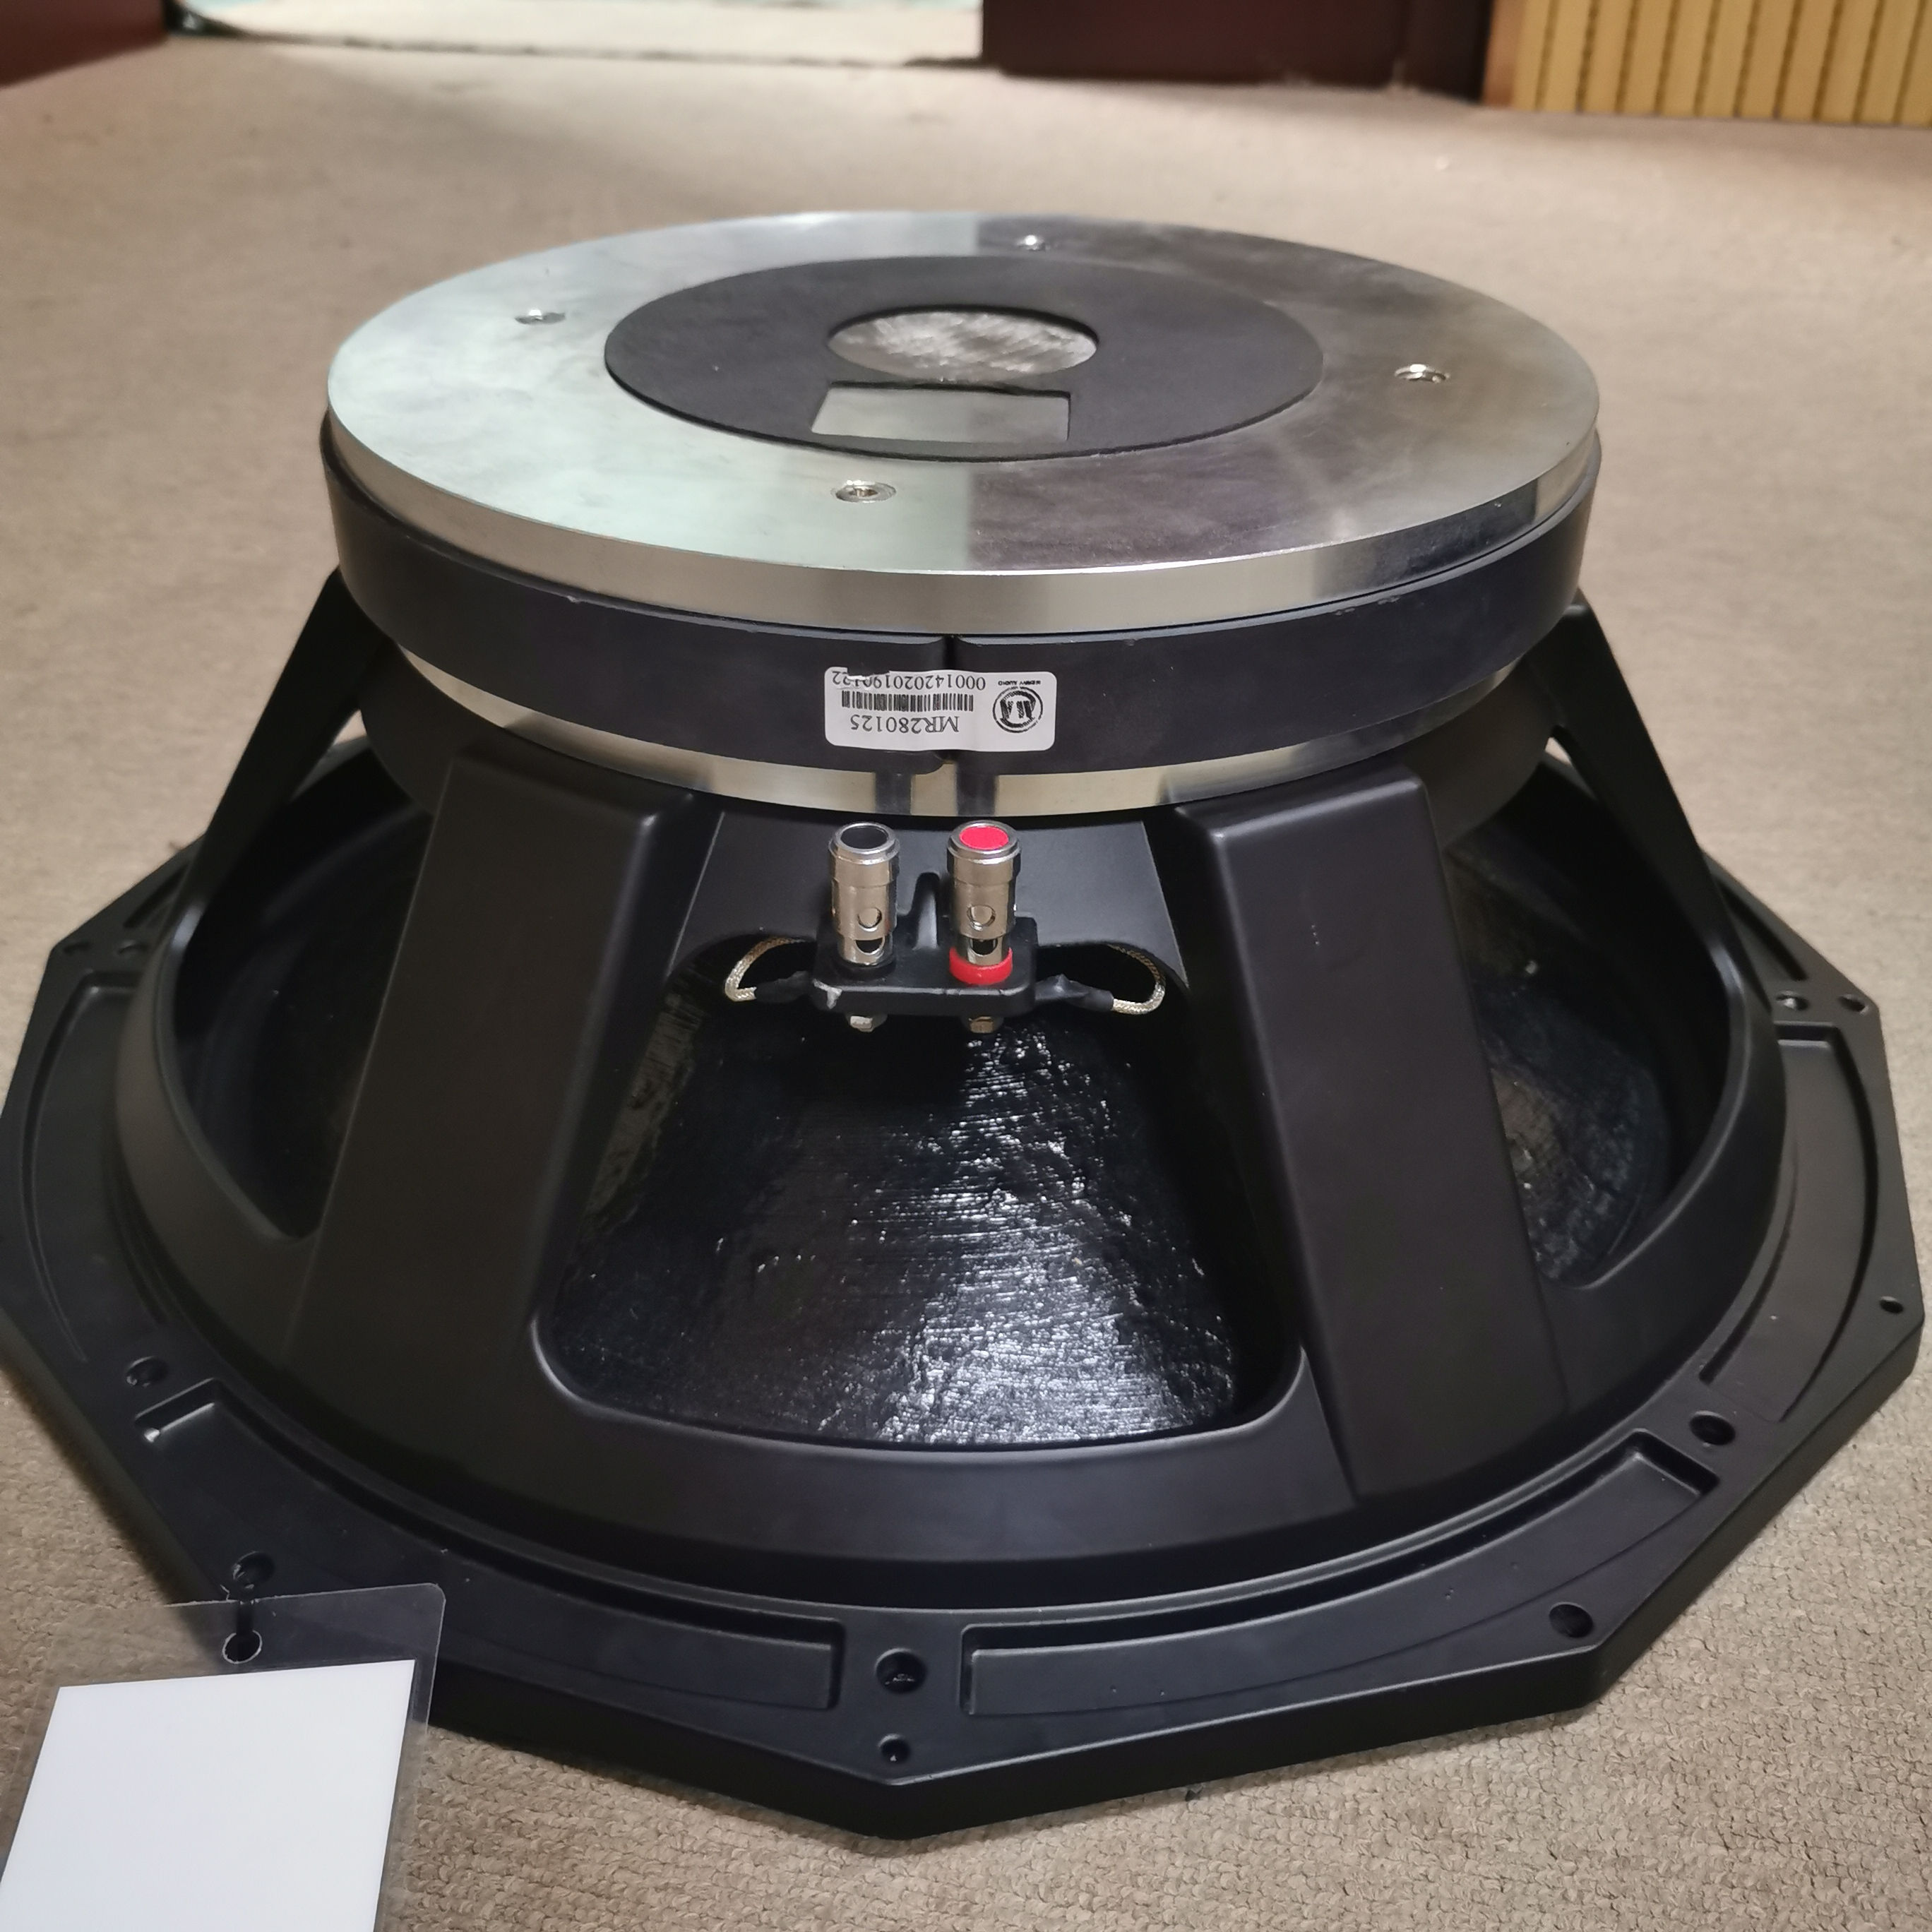 MR18280125 fashion sound subwoofer hi-fi woofer professional stage good sounds cheap price speaker 18 inch